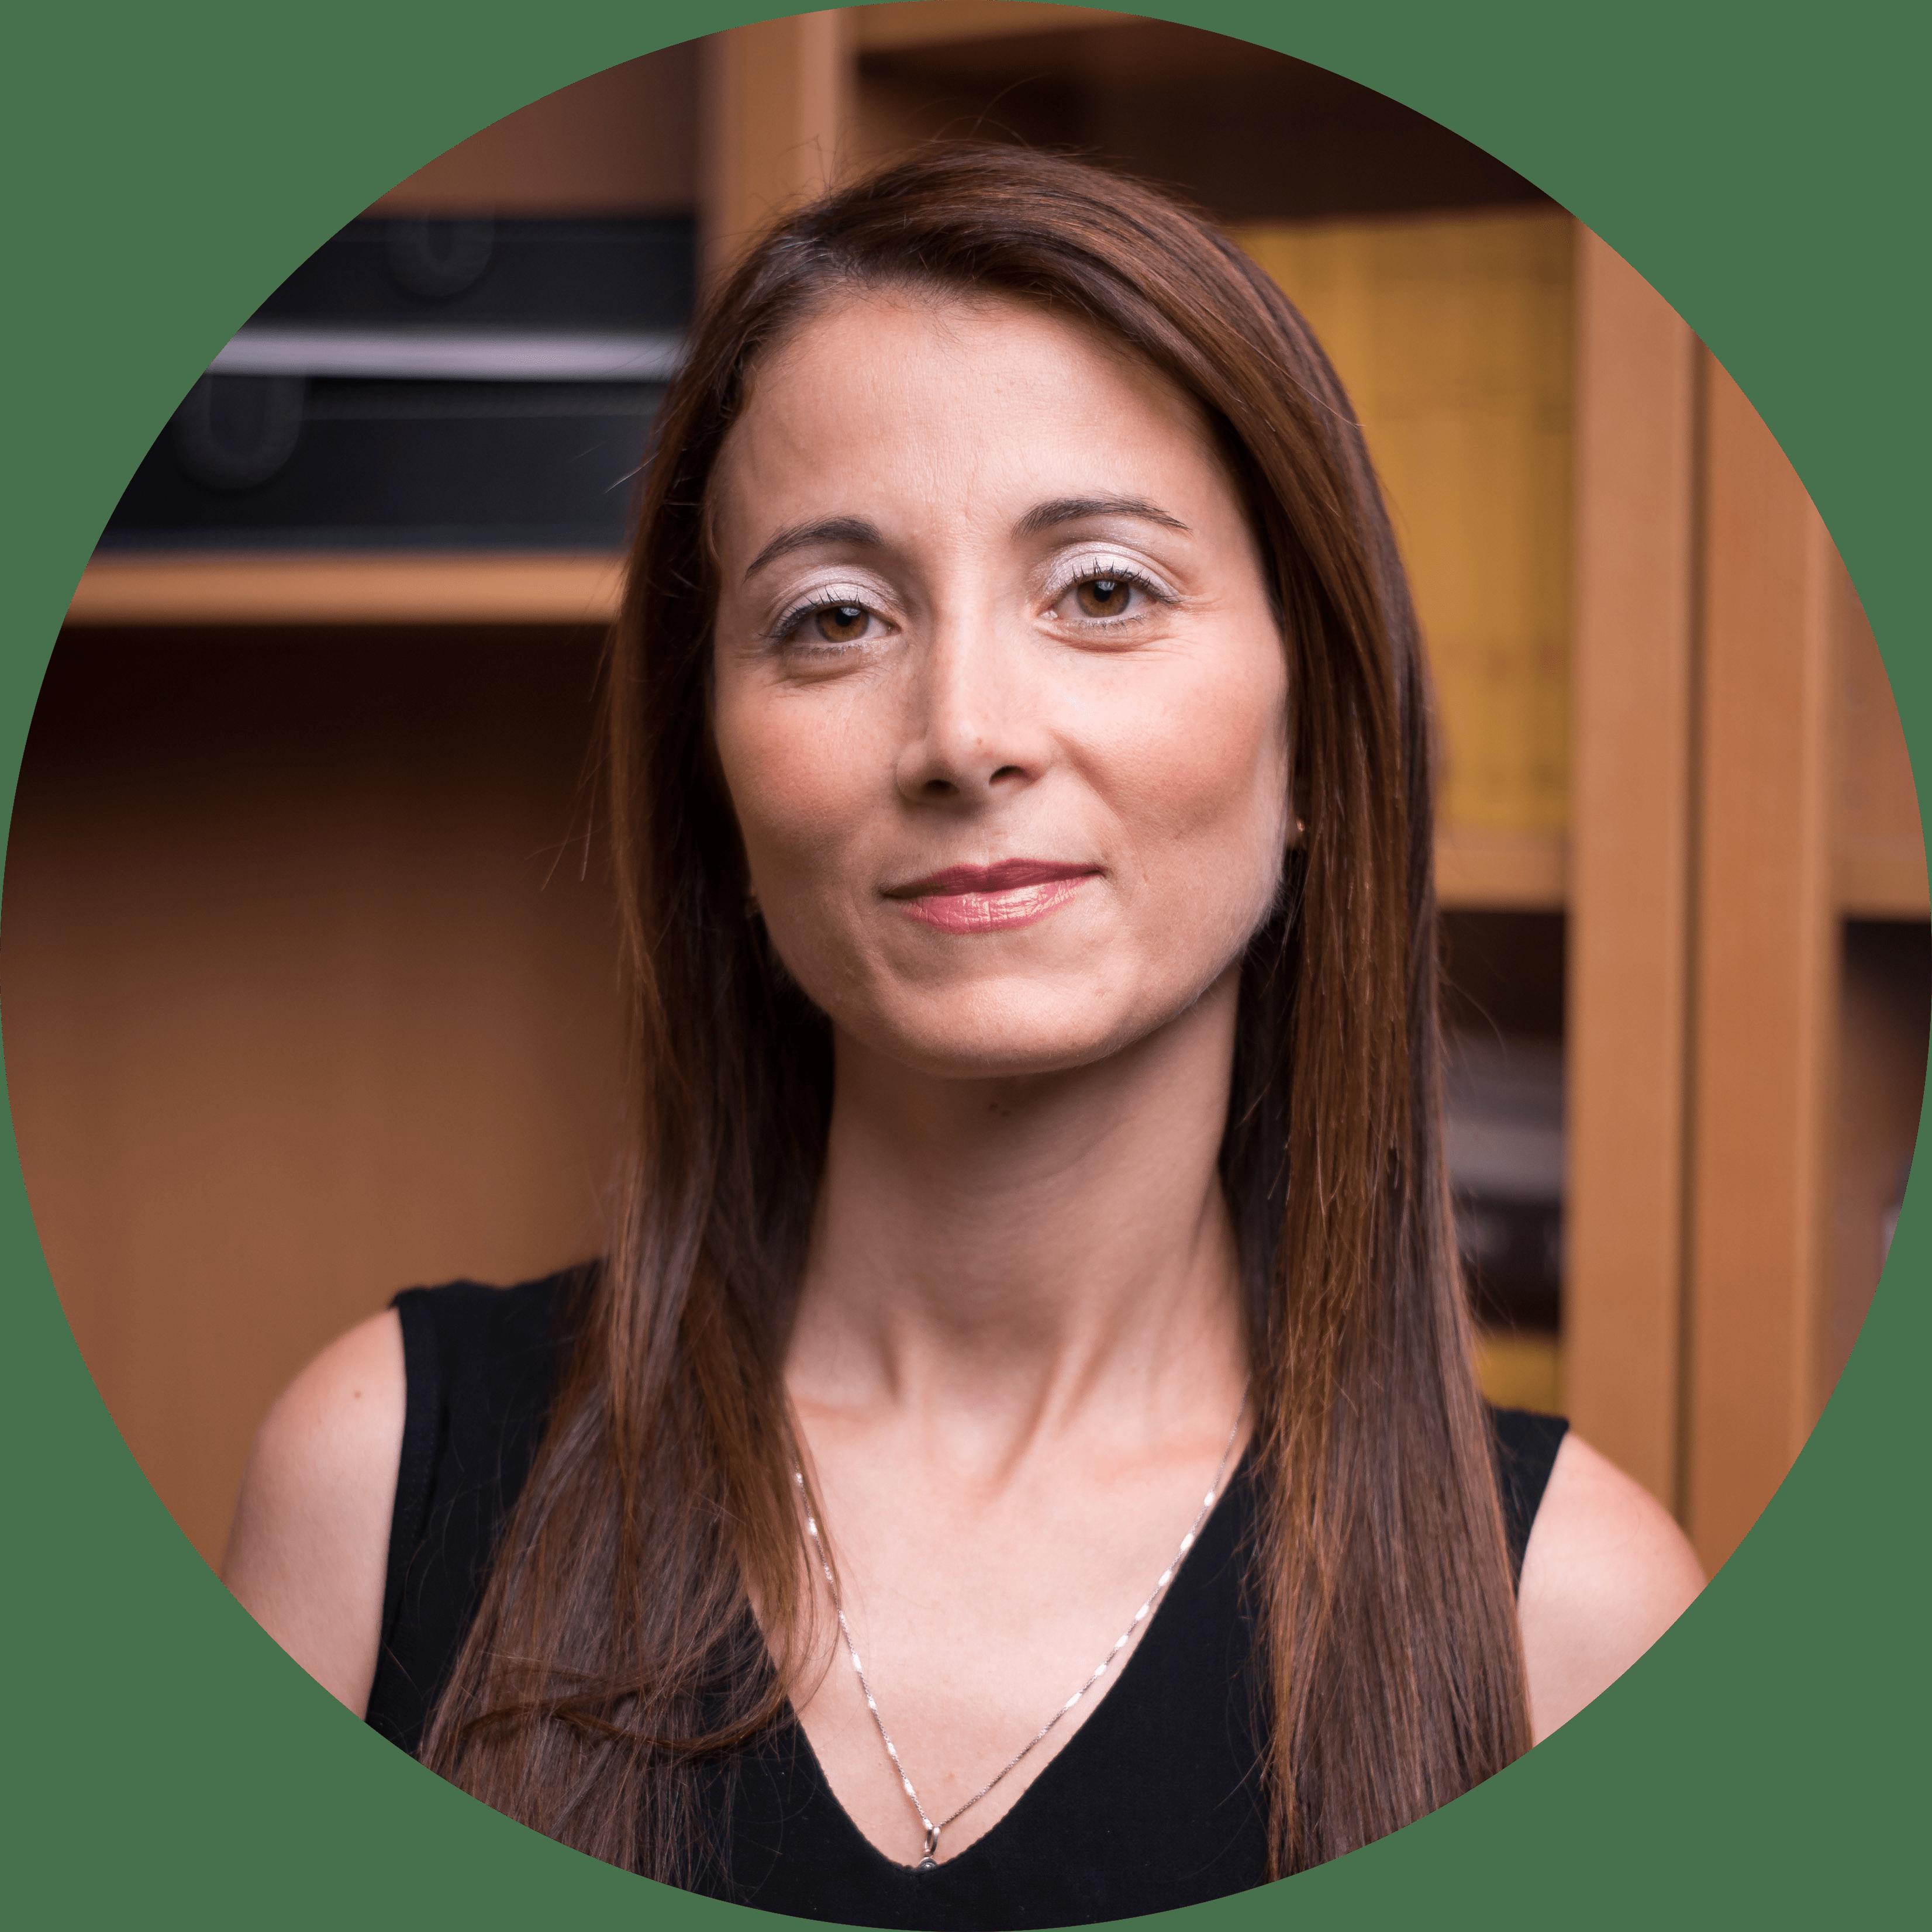 Dott.ssa Rossella Berardi – Sessuologa Roma